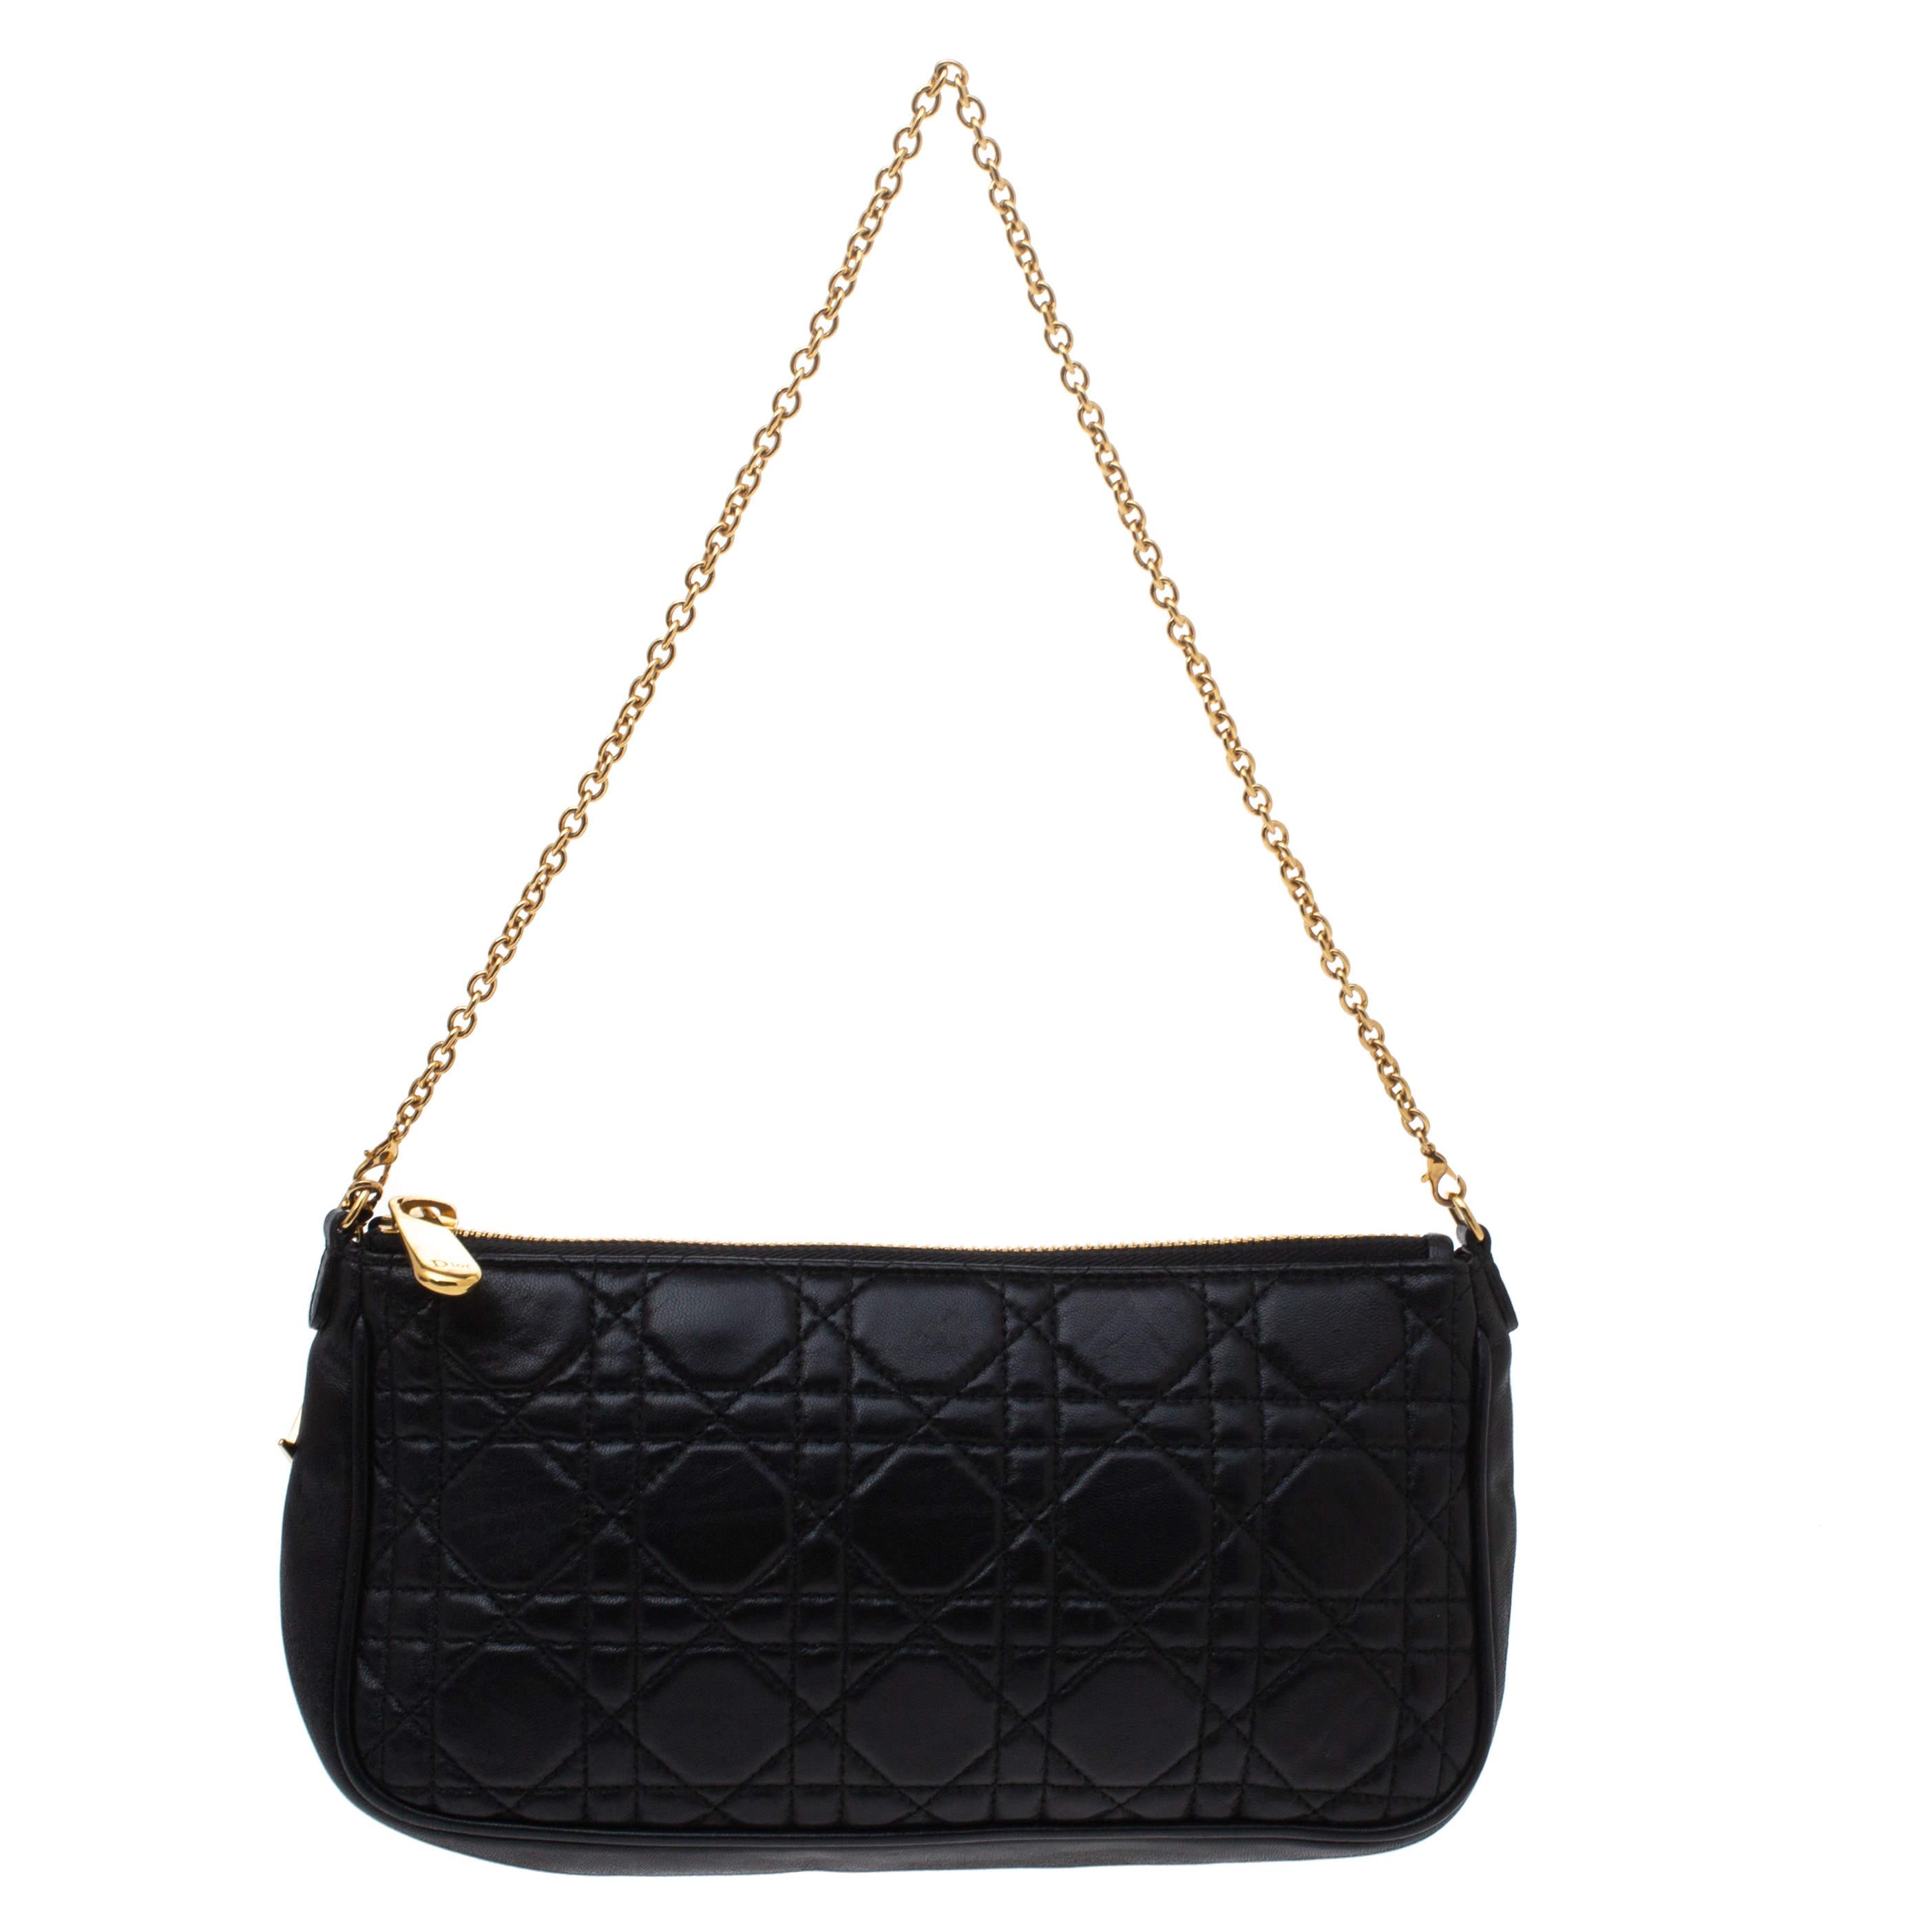 Dior Black Cannage Leather Chain Clutch